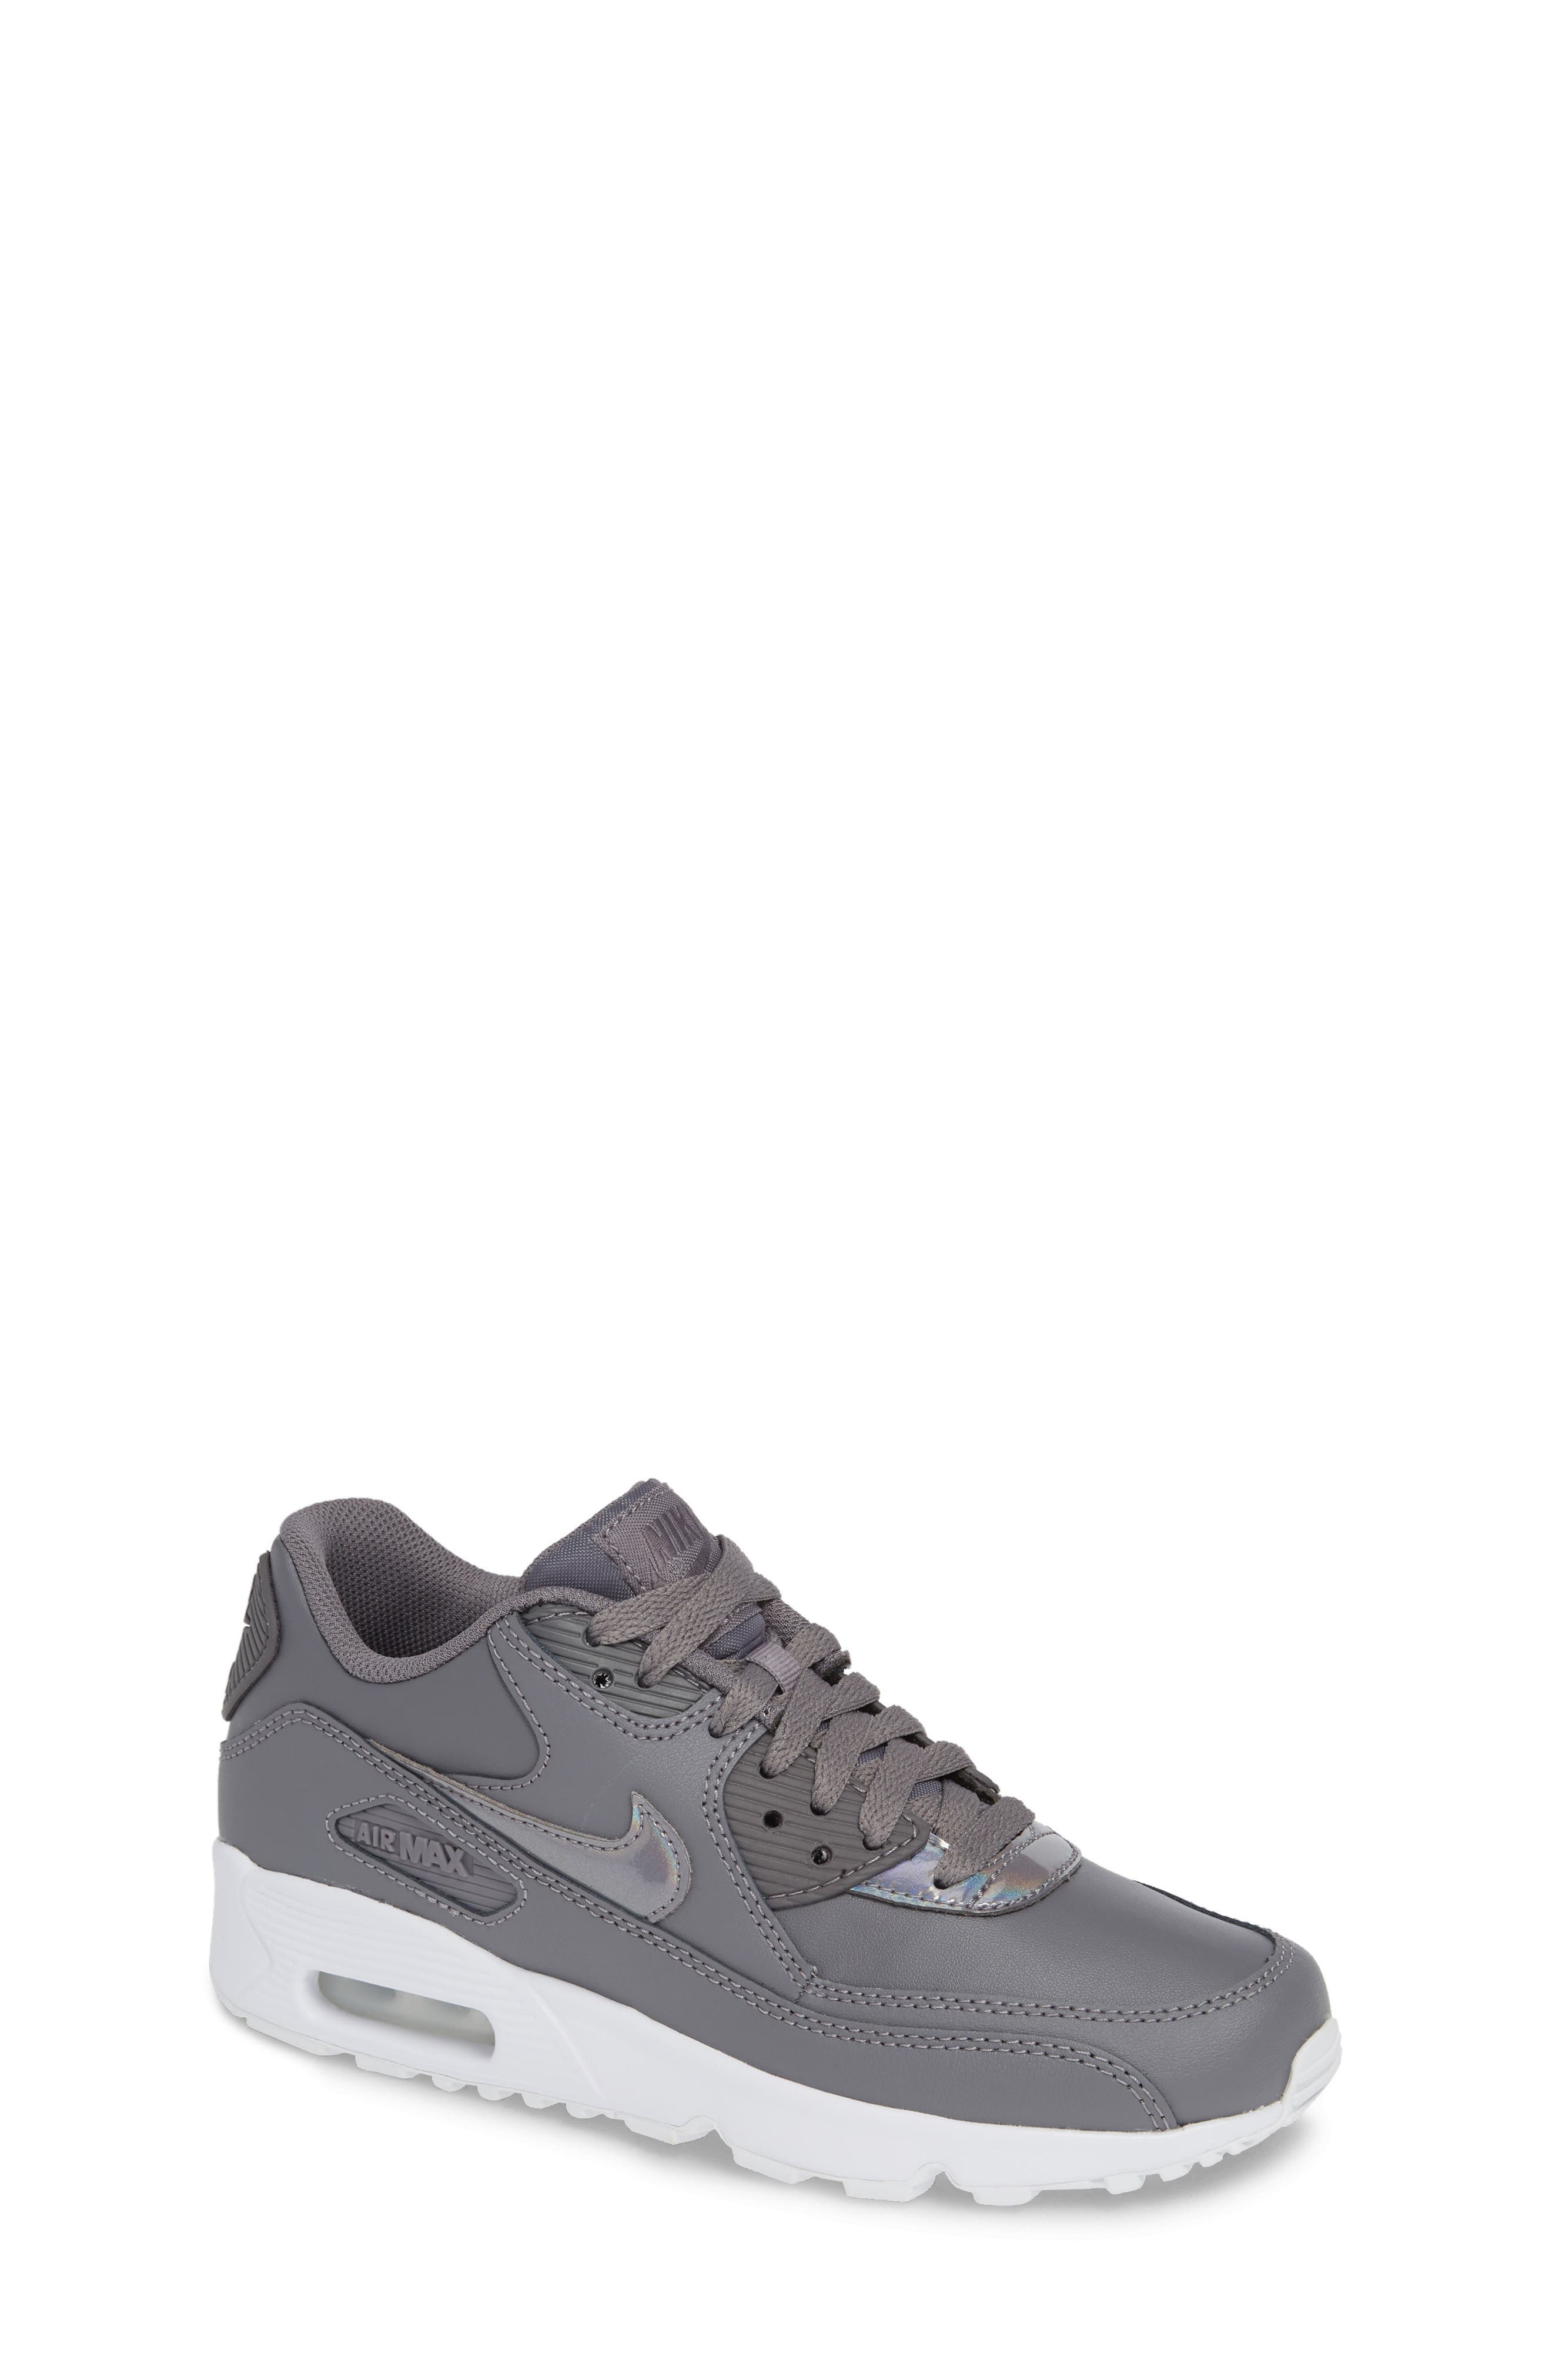 'Air Max 90' Sneaker,                         Main,                         color, GUNSMOKE/ WHITE